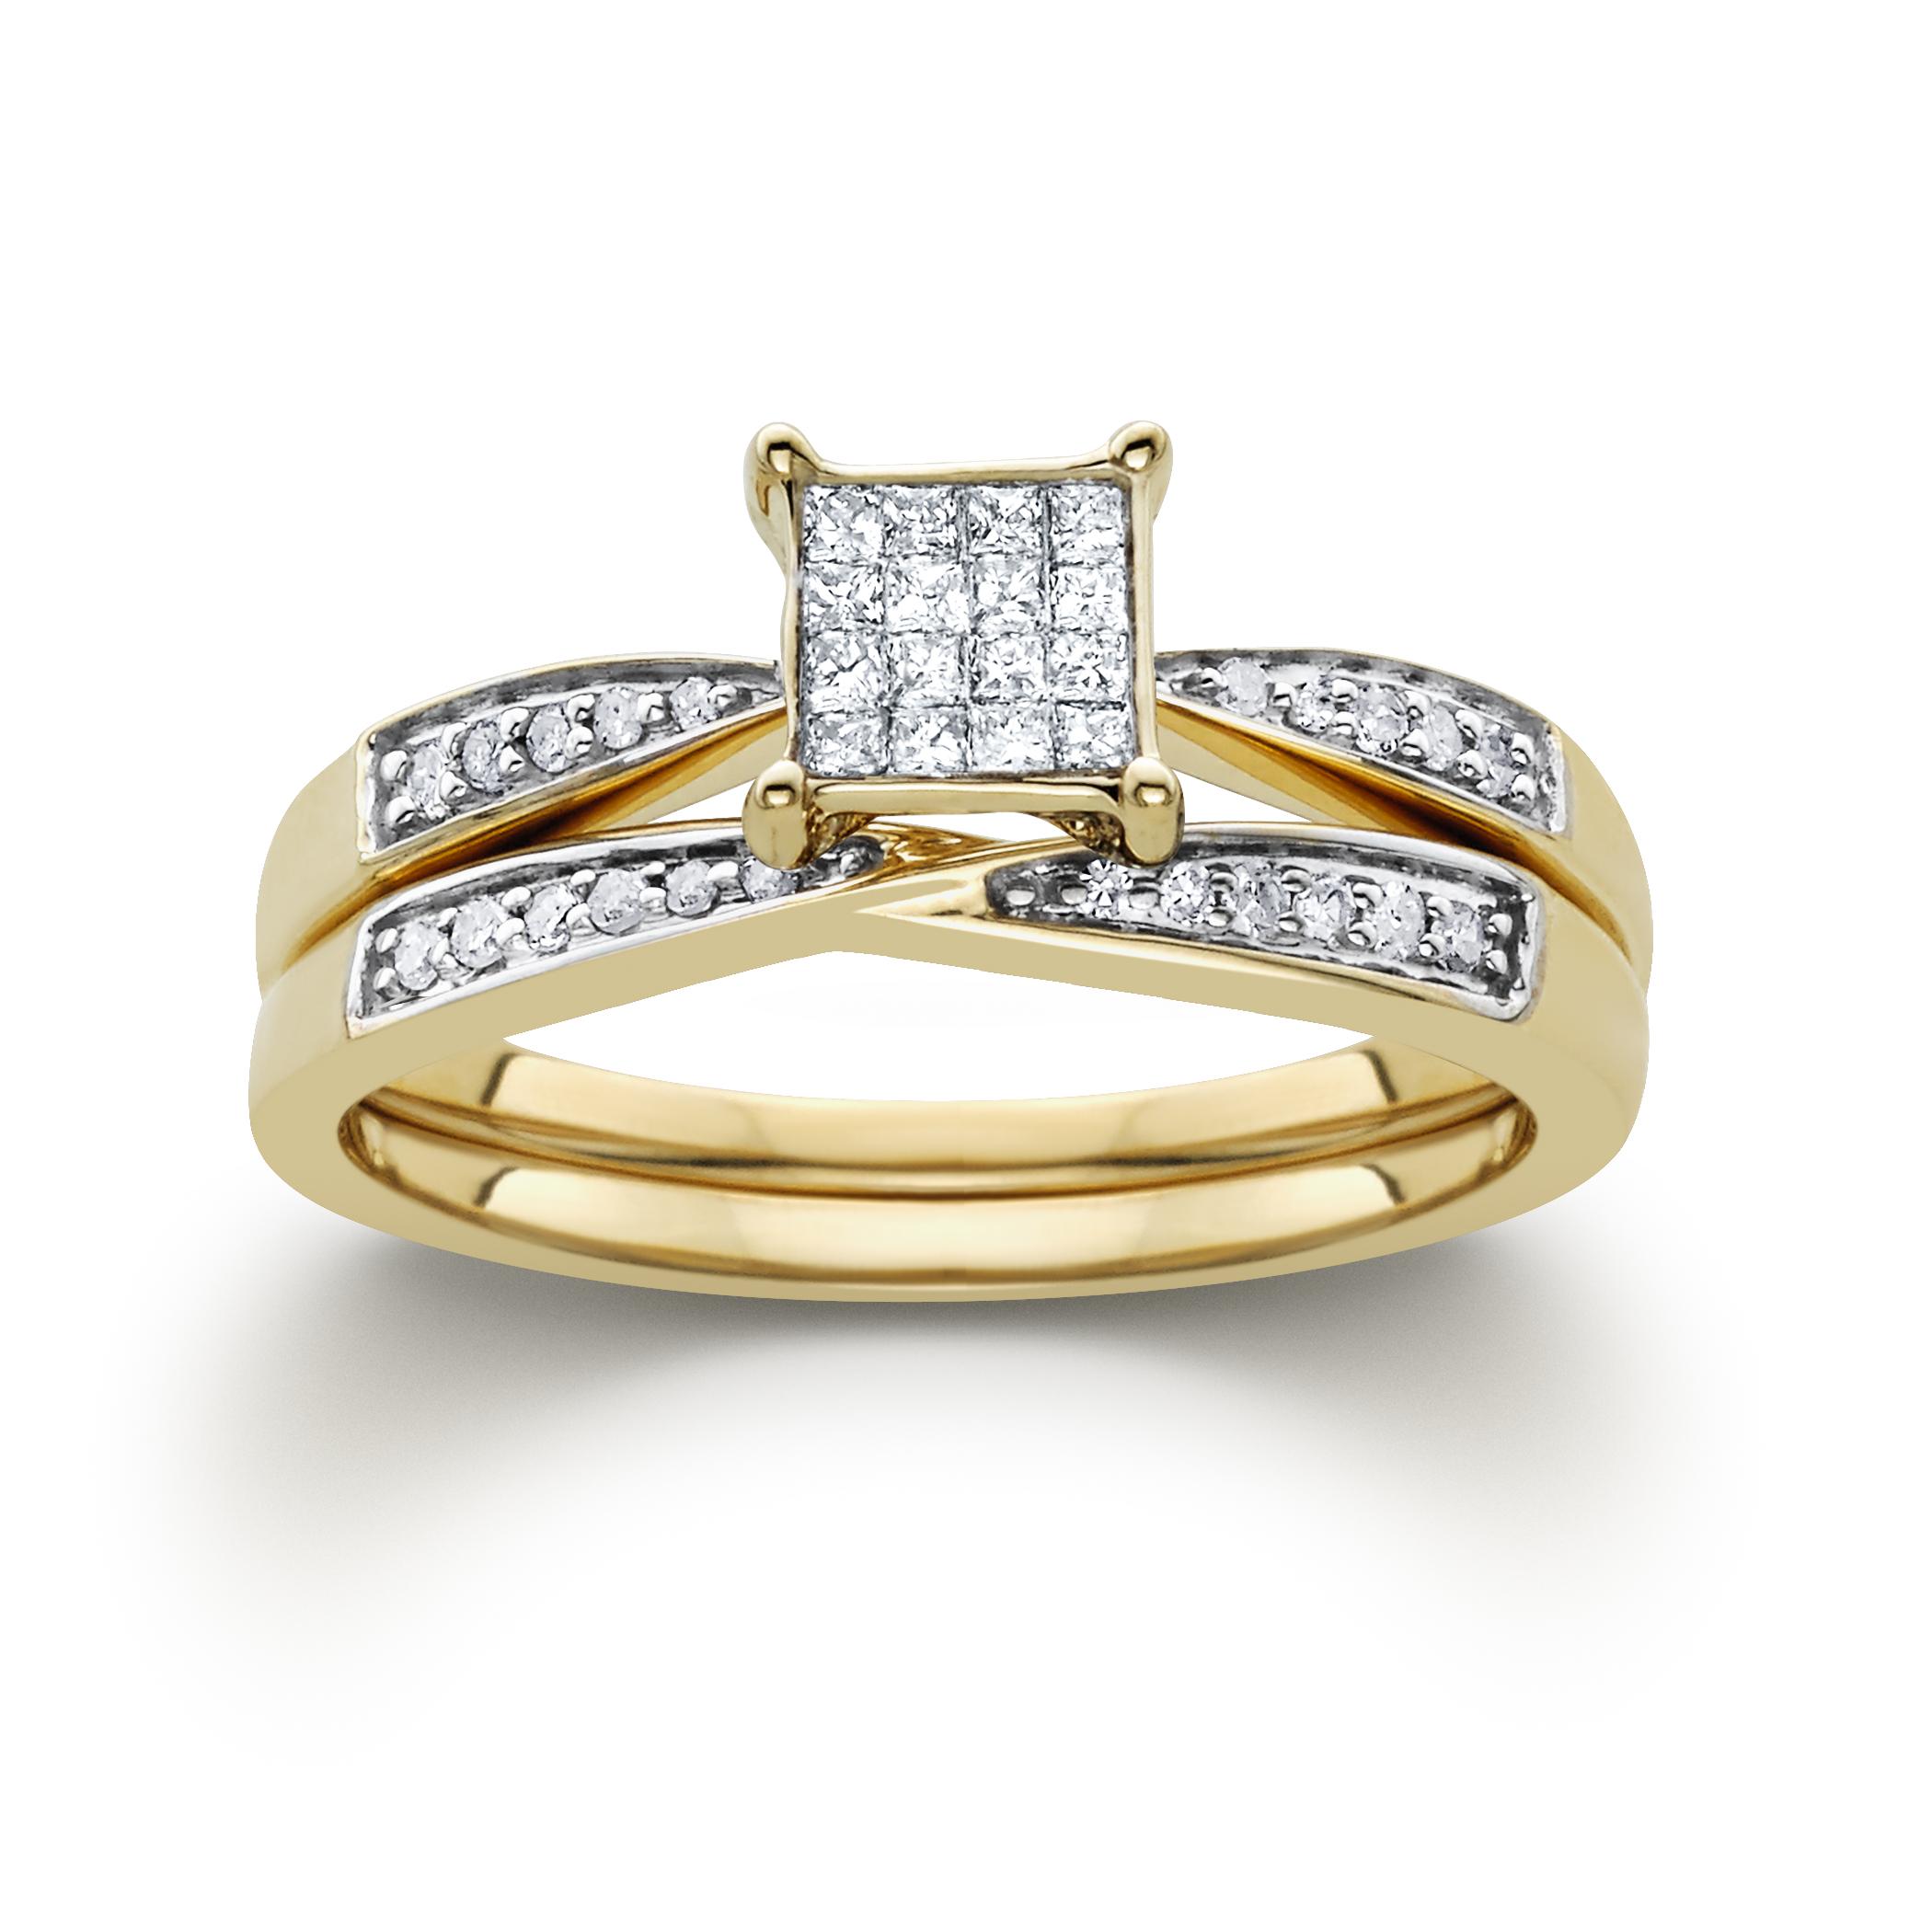 b disney wedding ring Wedding Engagement